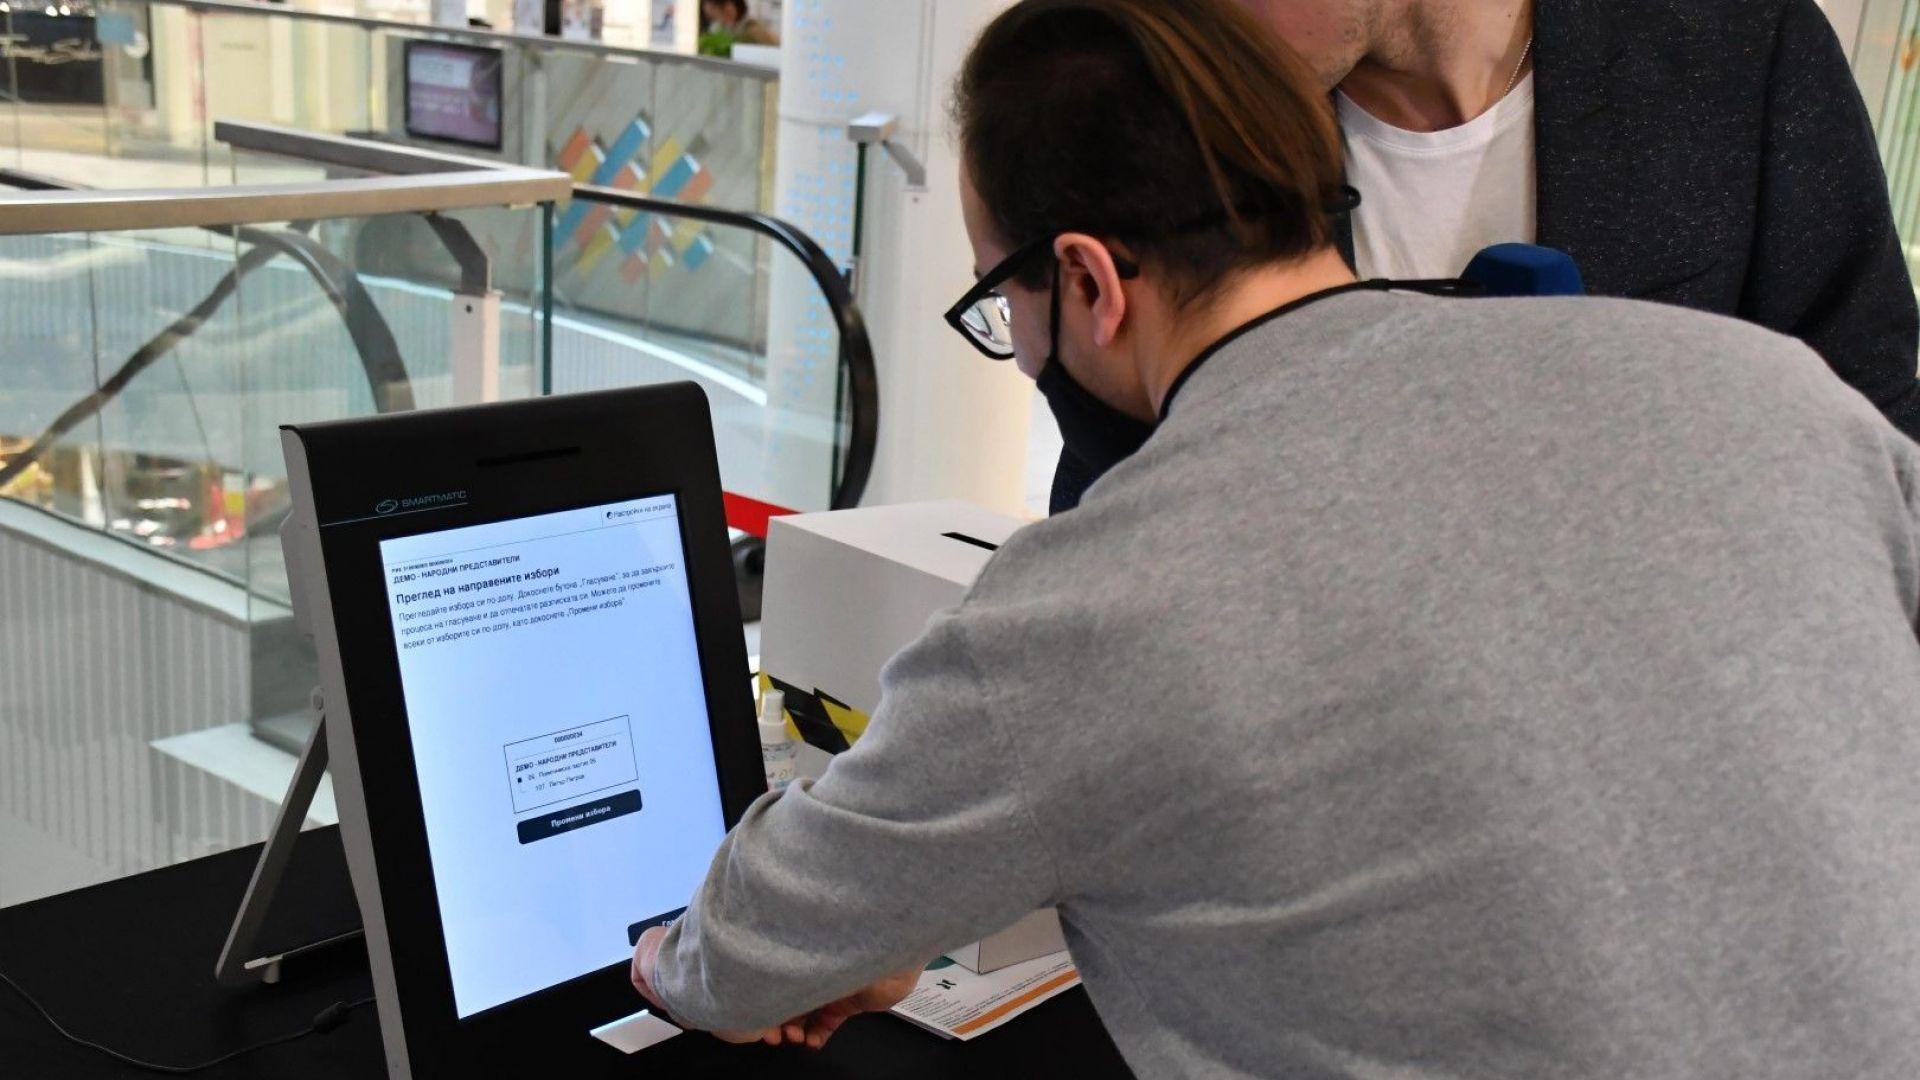 """Сиела"" иска 14,4 млн. лв. наем за 9600 машини за гласуване, ако ЦИК не ги плати до вота"